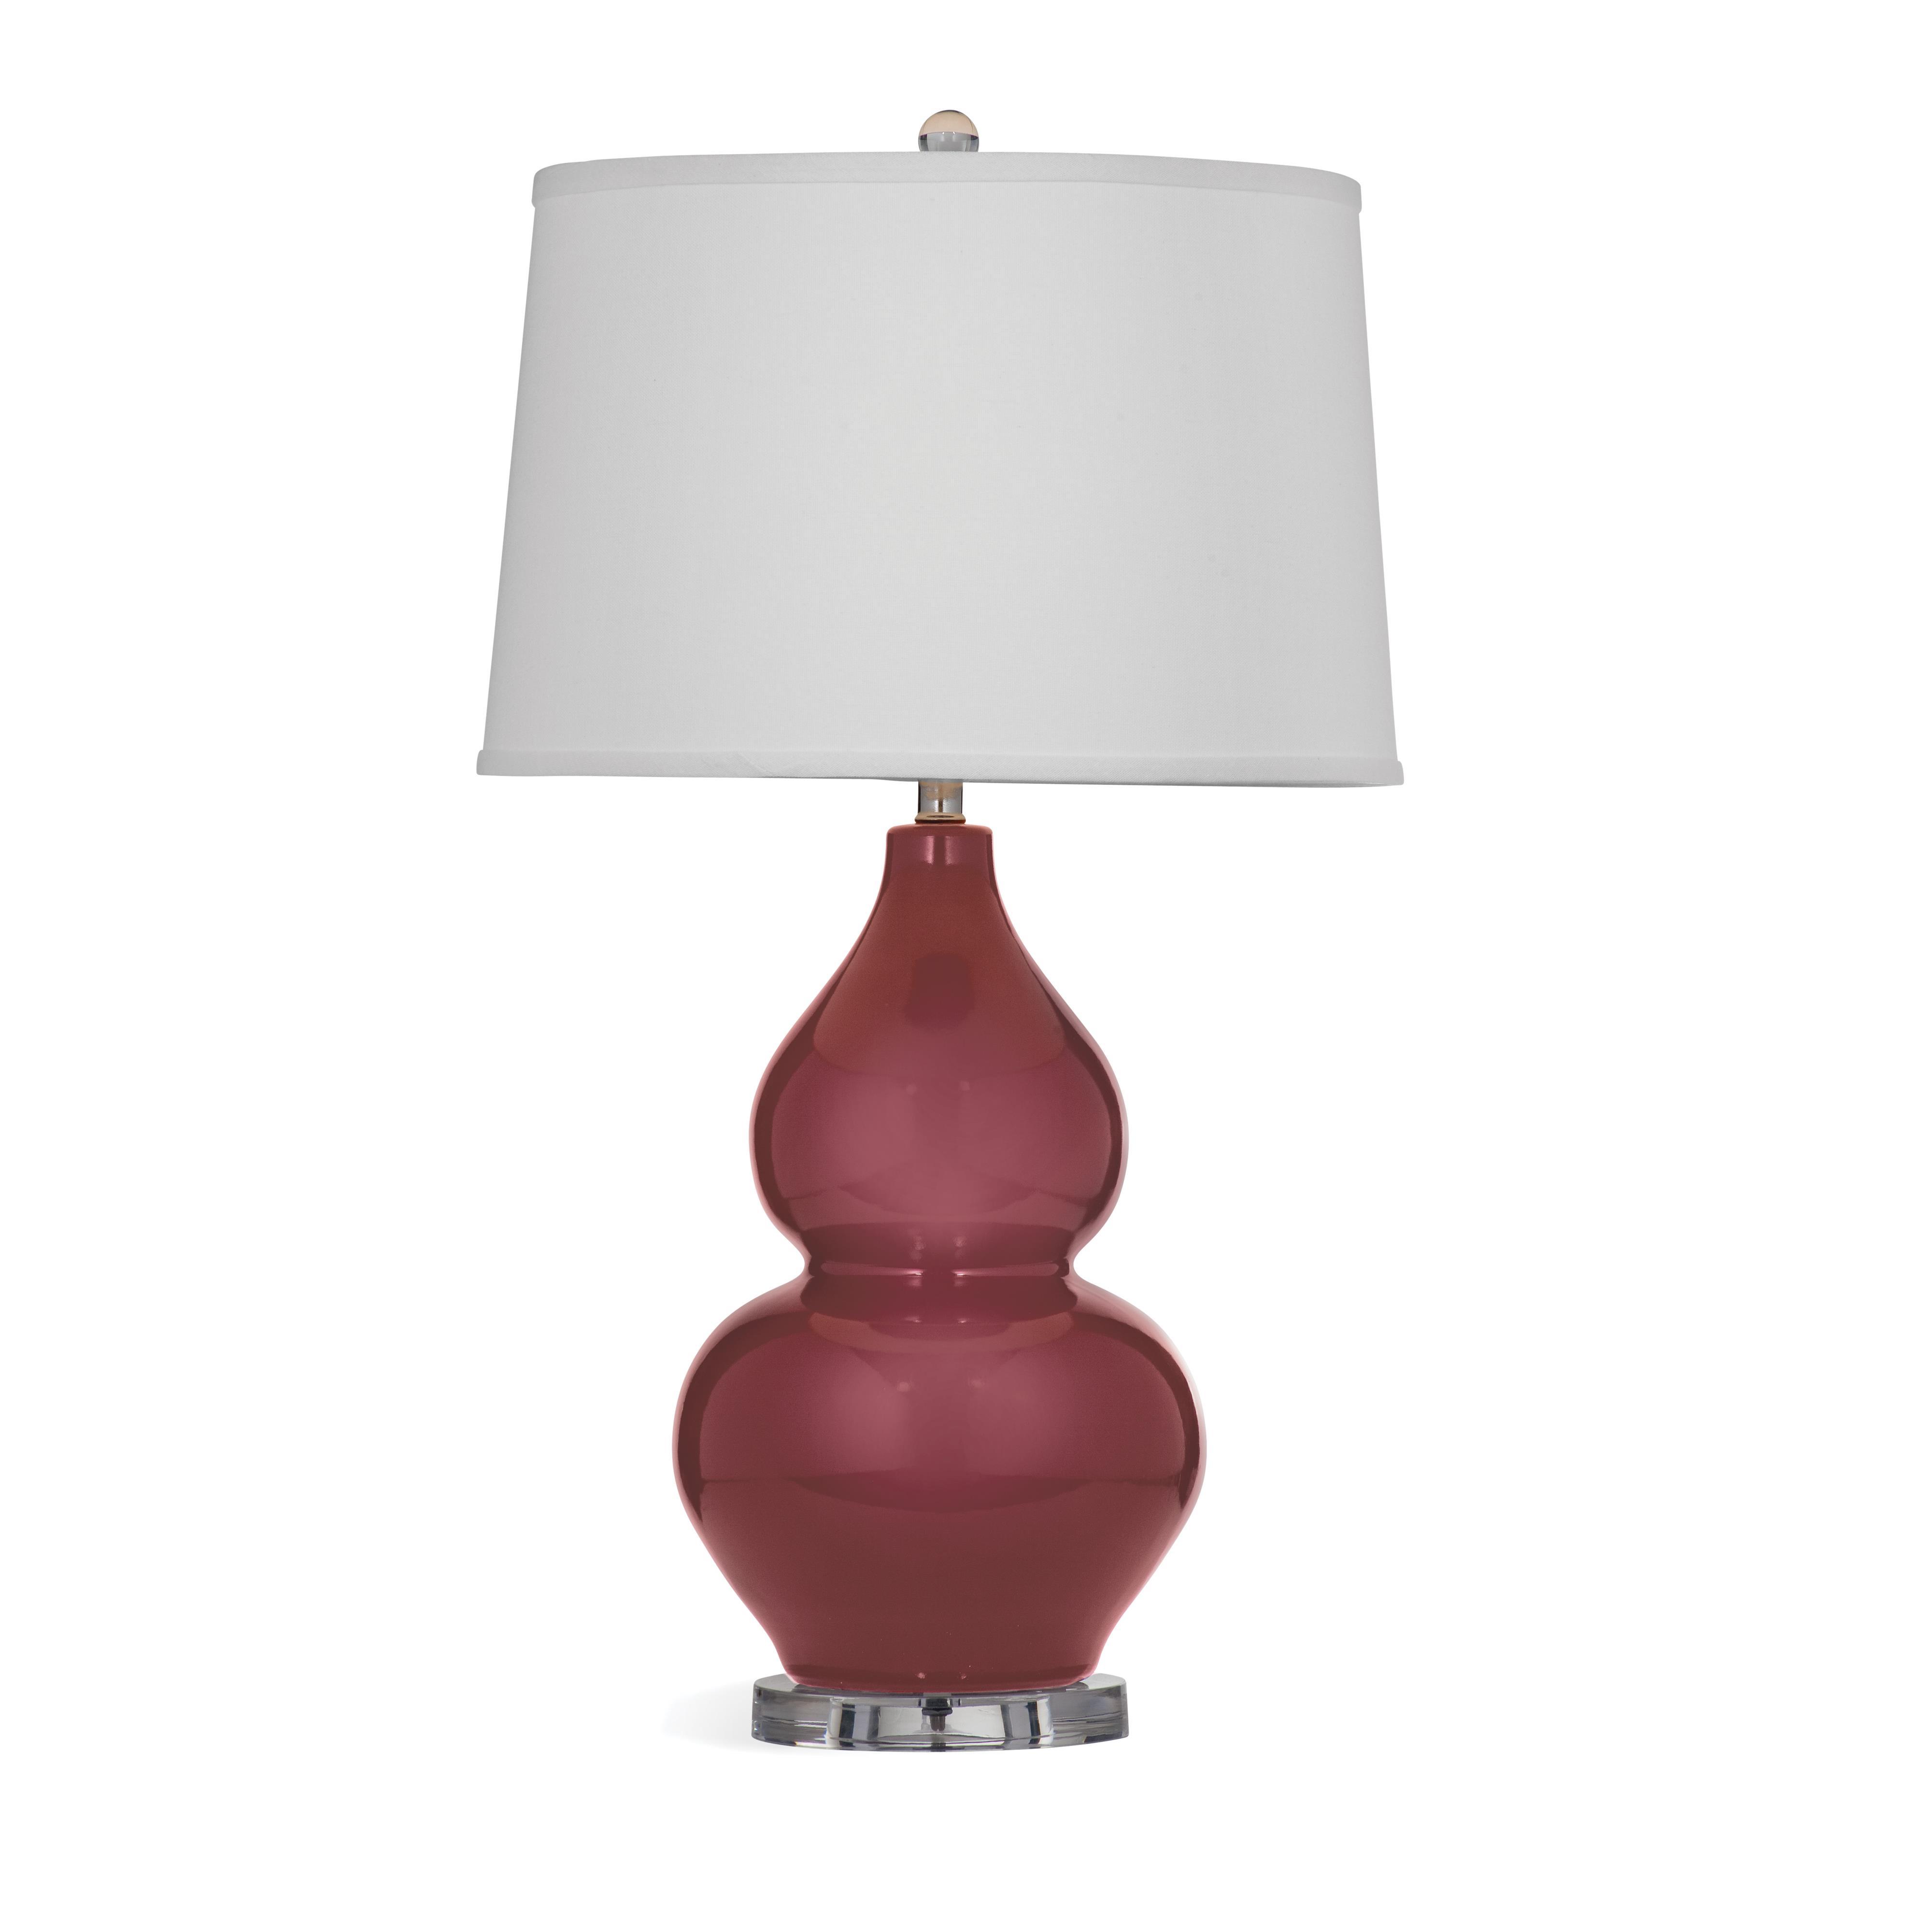 Hali Table Lamp